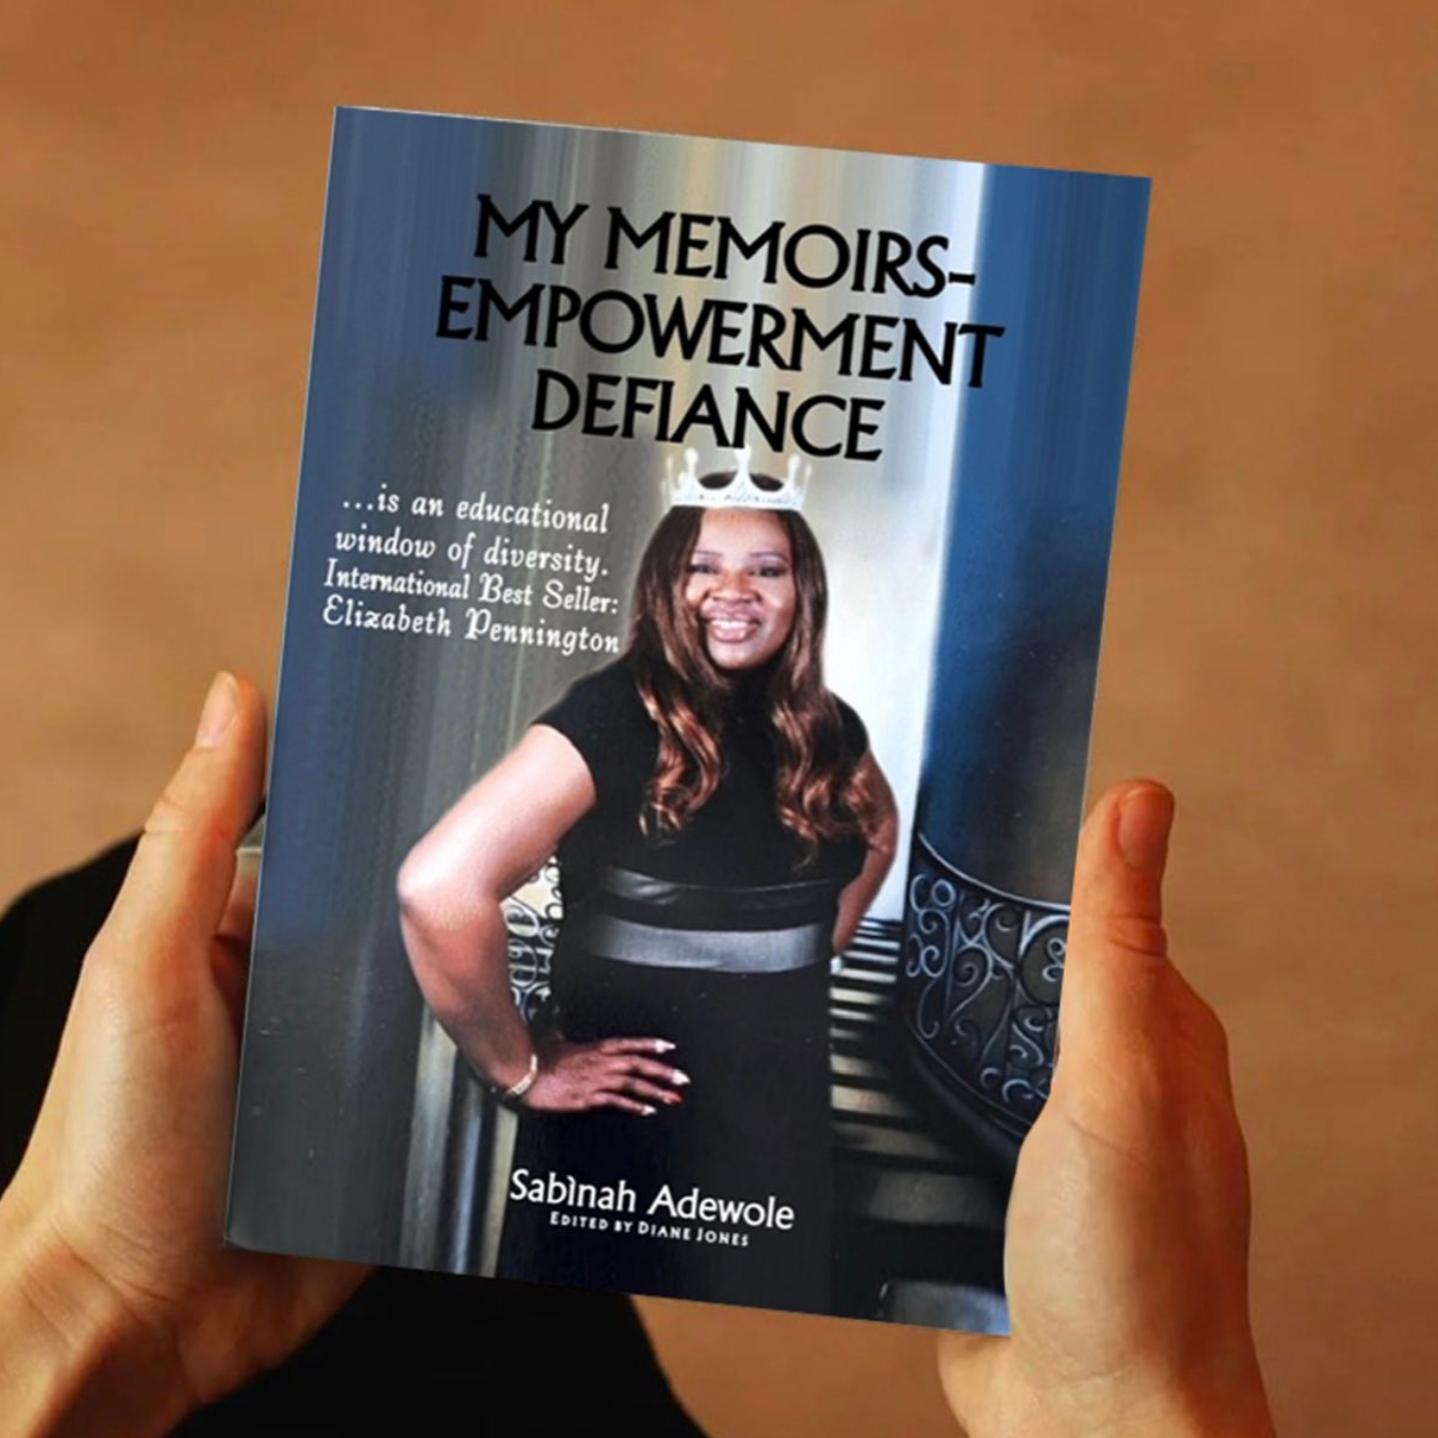 My Memoirs Empowerment Defiance